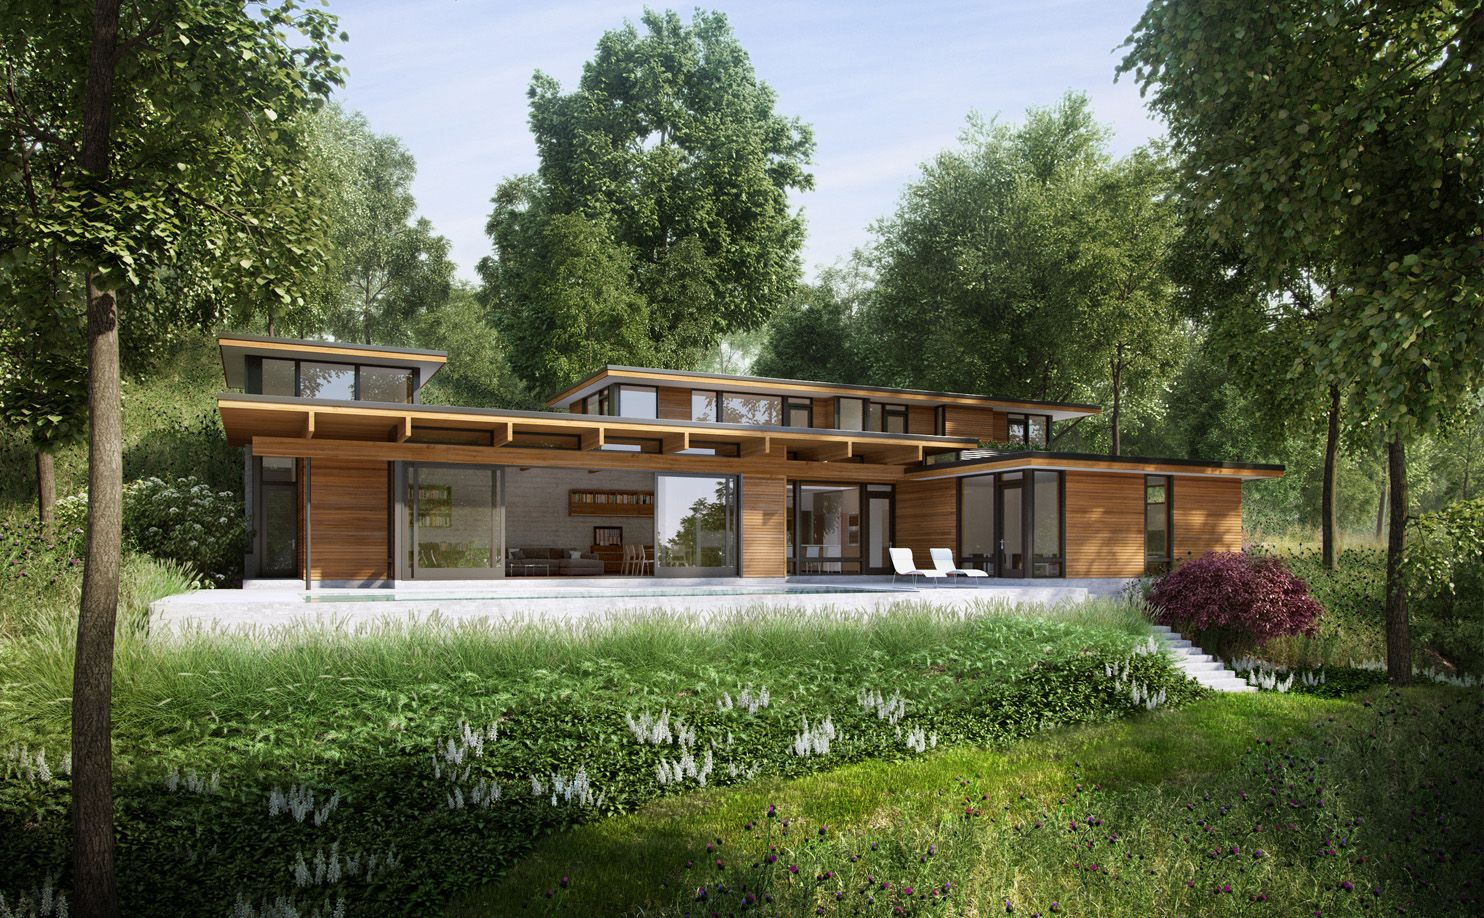 Axiom 3250 - Turkel Design 4 Bedrooms Office Family